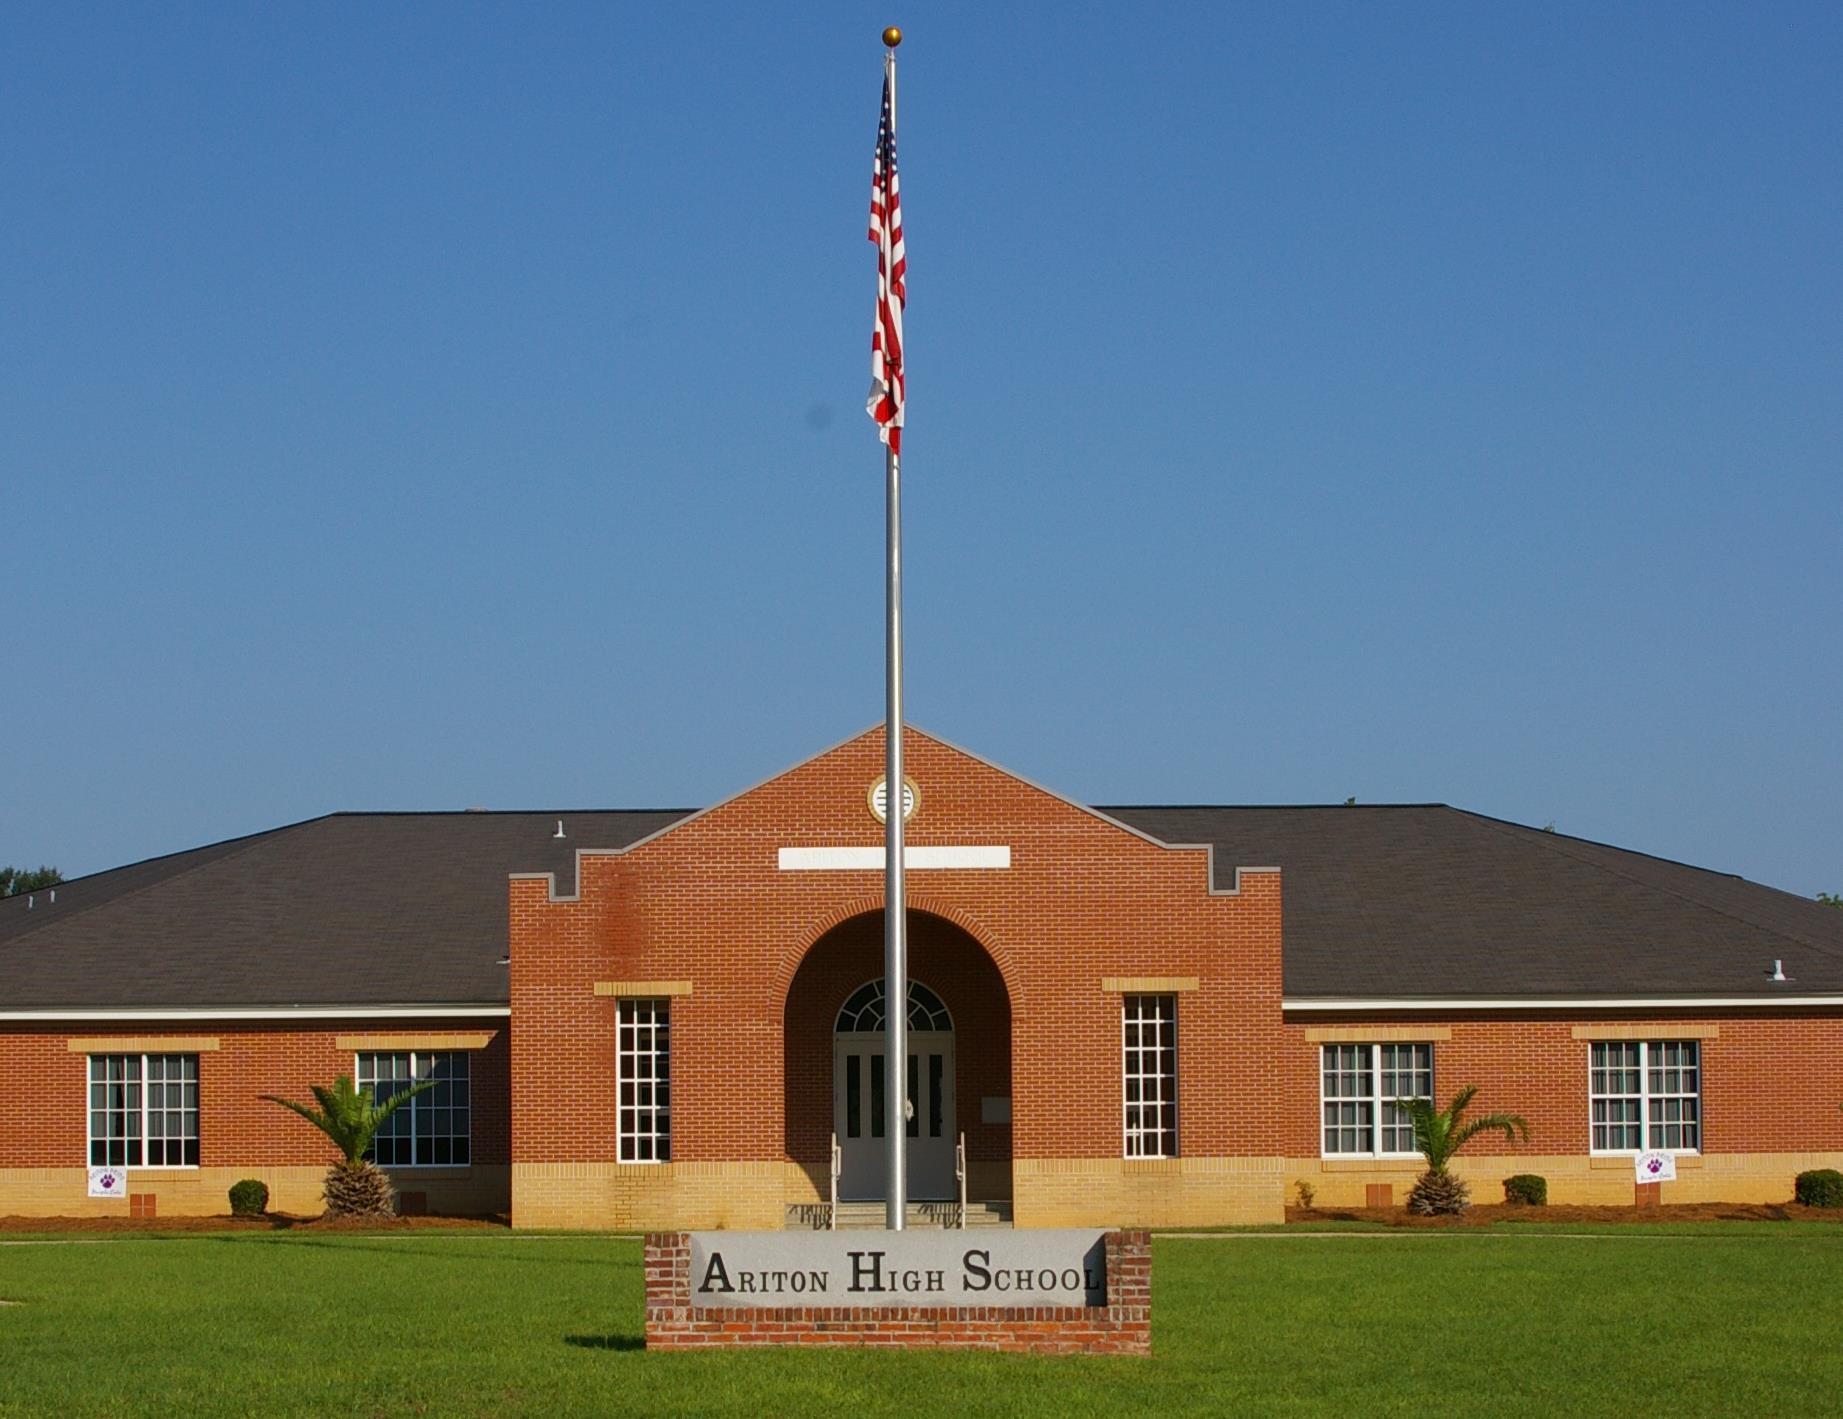 Ariton School